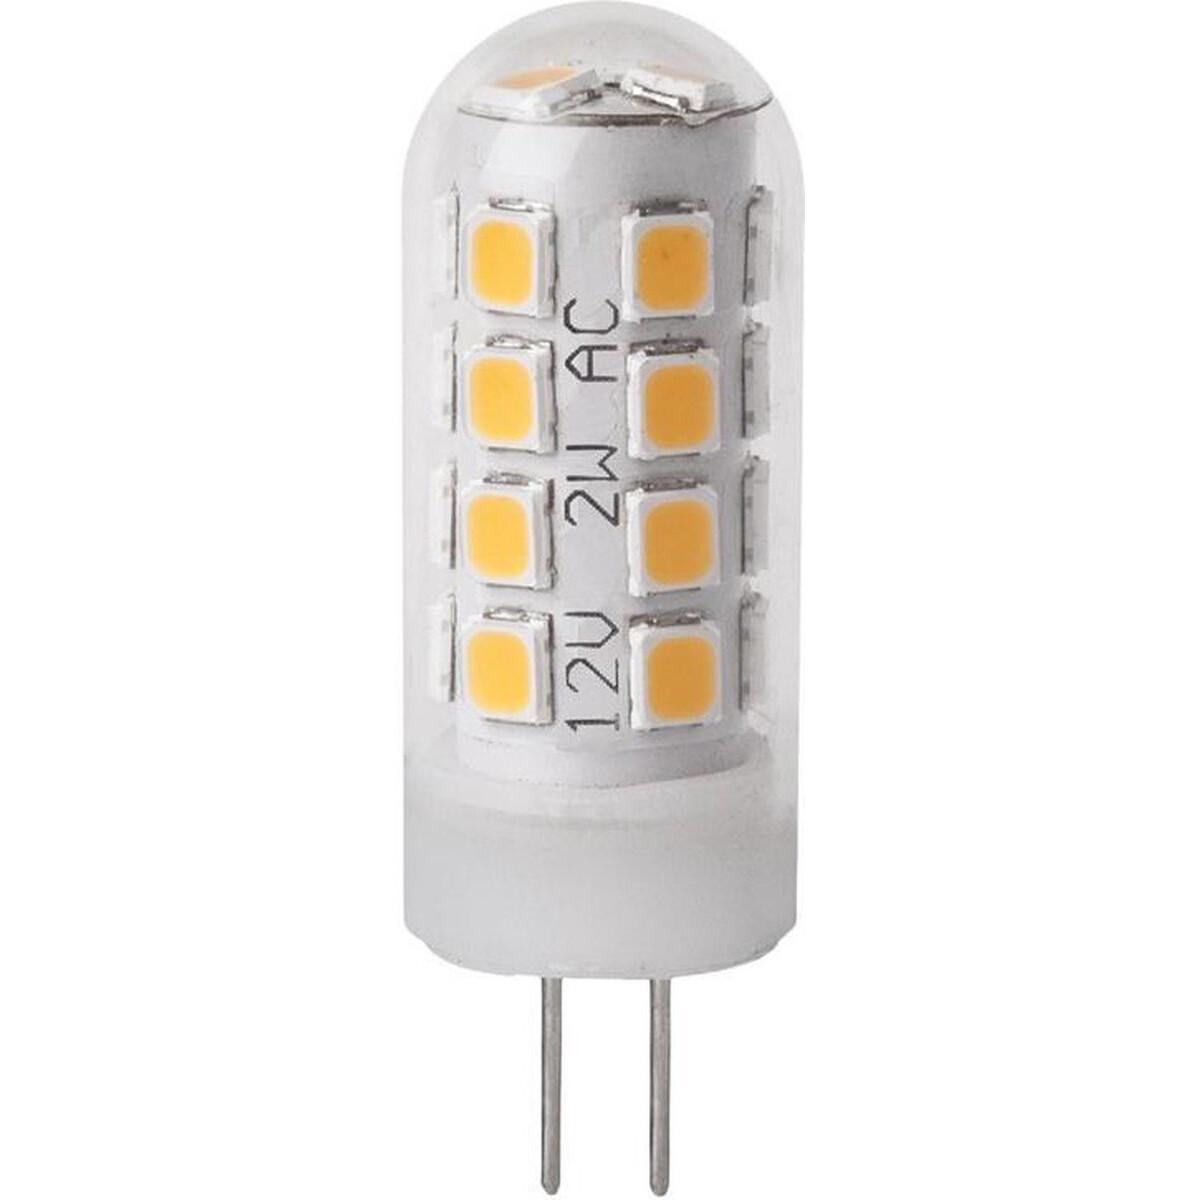 MEGAMAN - LED Lamp - Storm - G4 Fitting - 2.5W - Warm Wit 2800K | Vervangt 25W